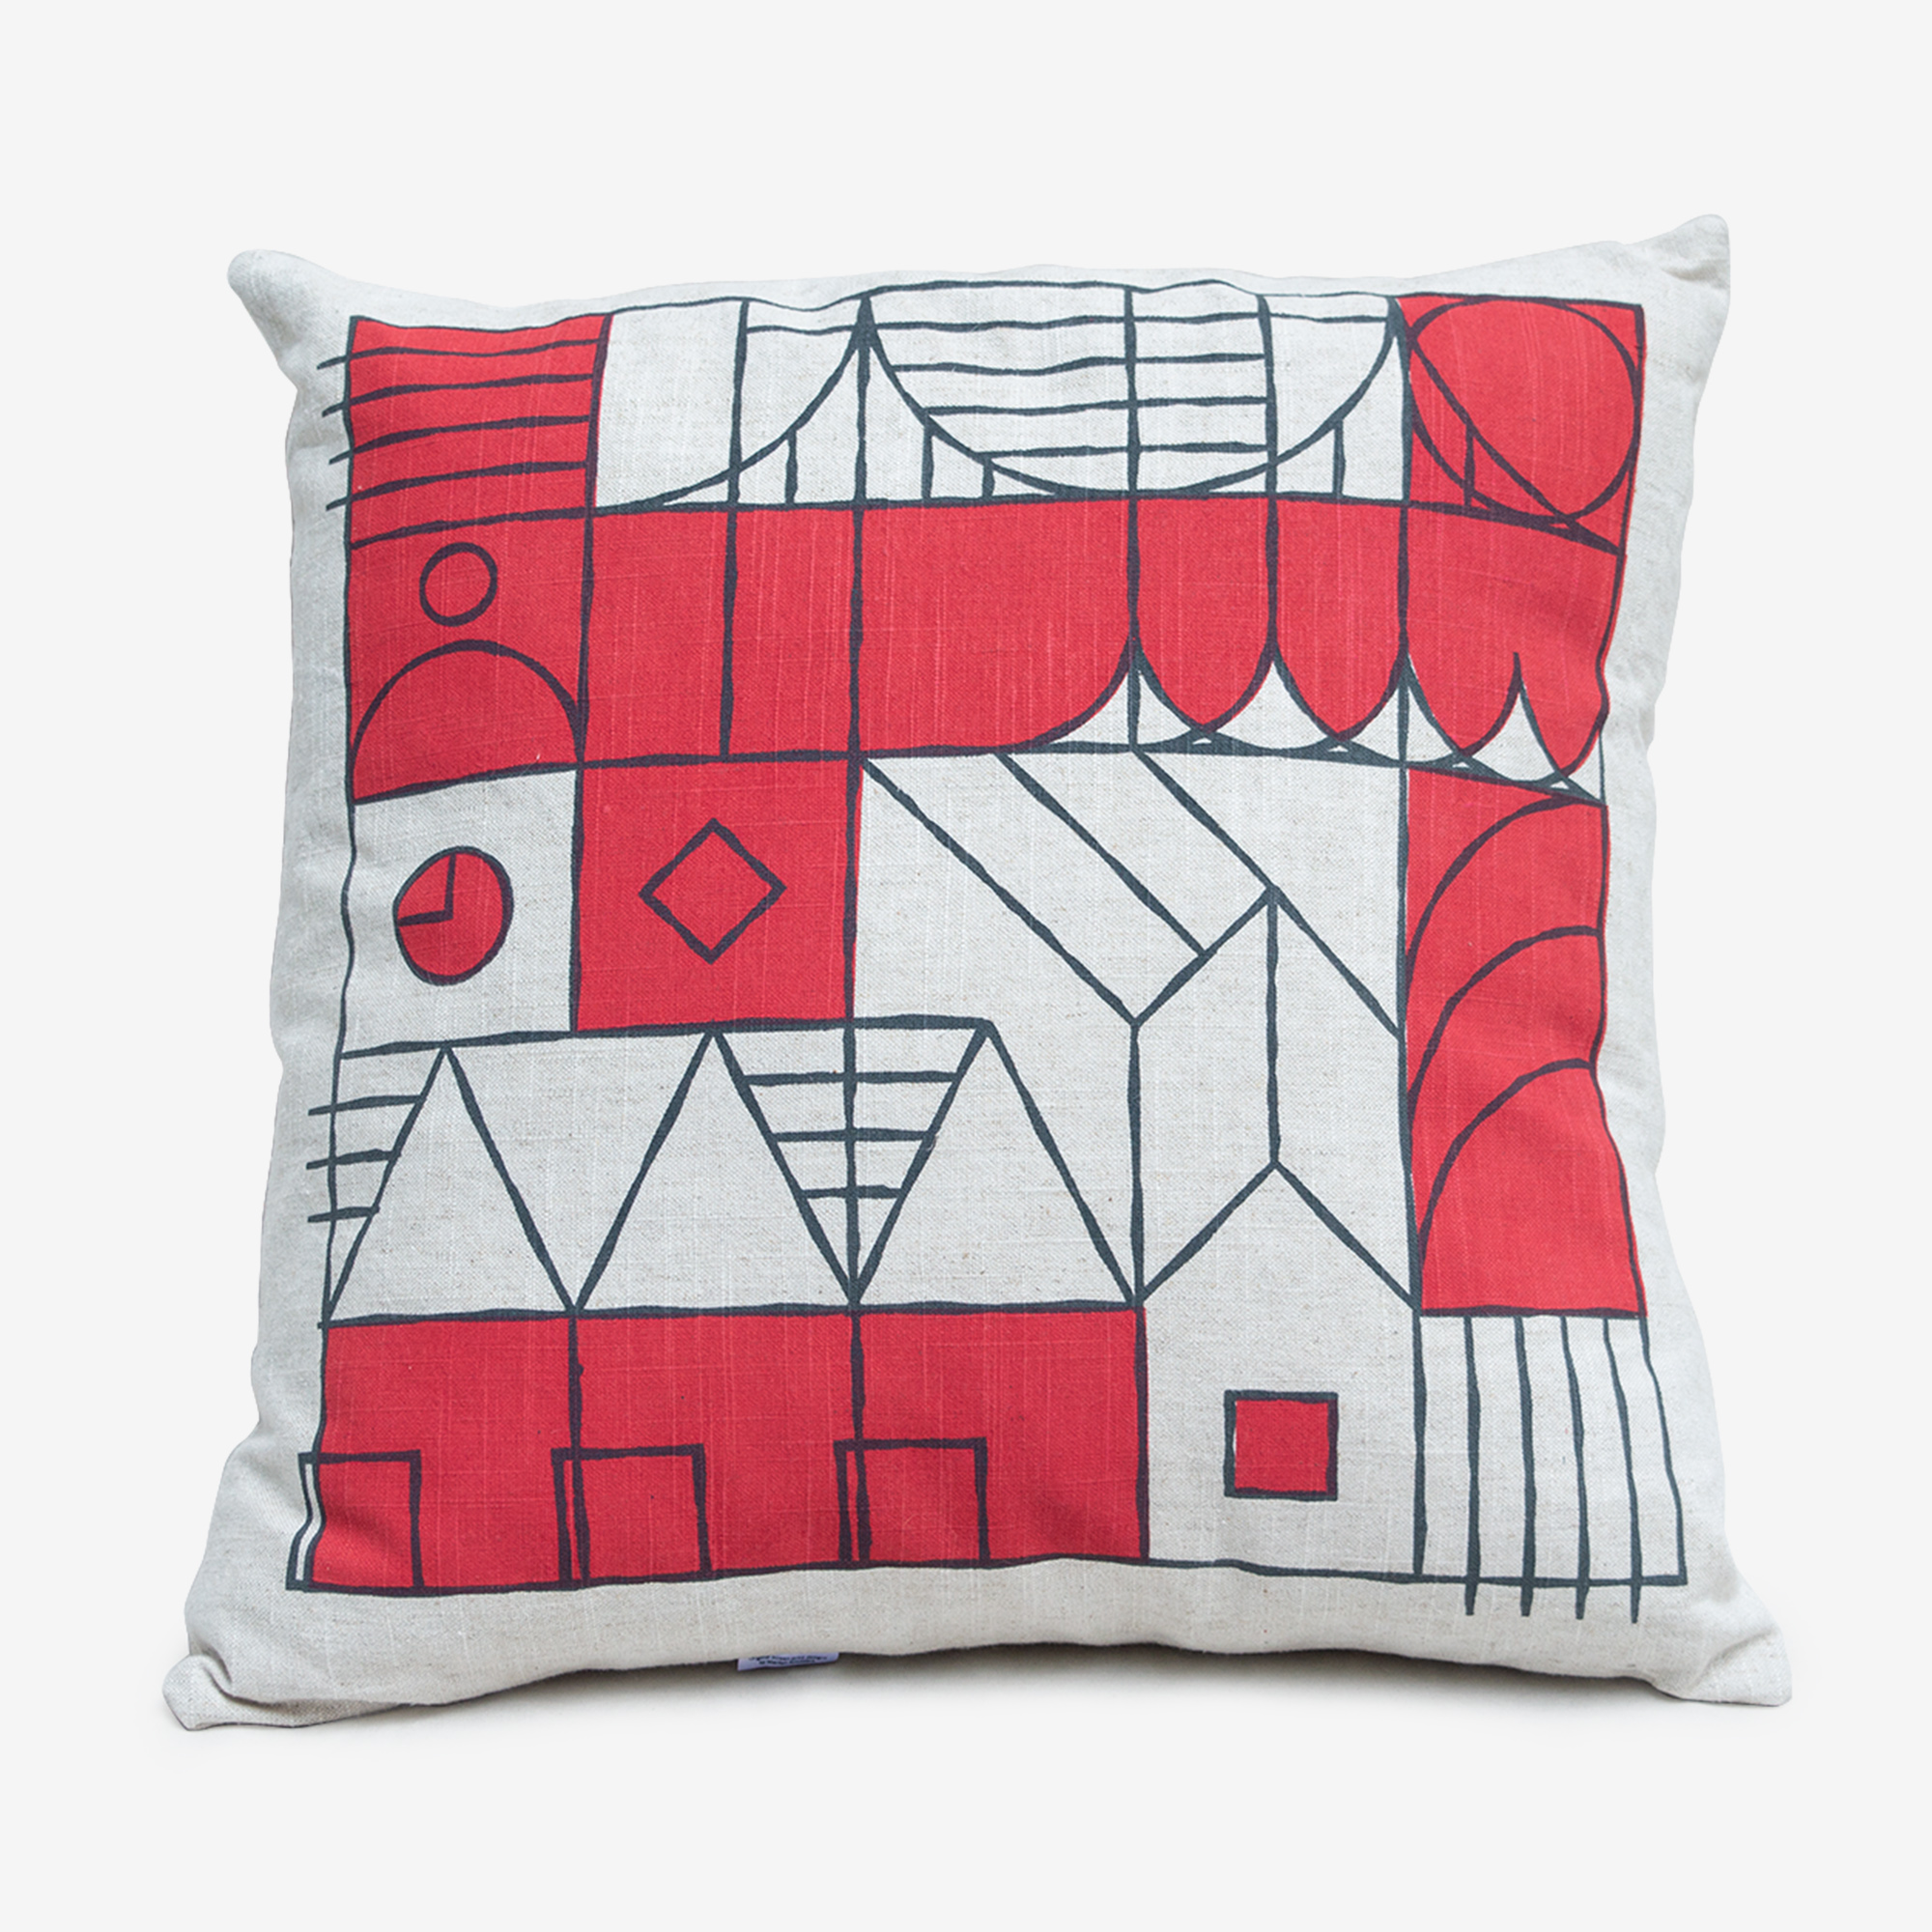 Pillow image.jpg